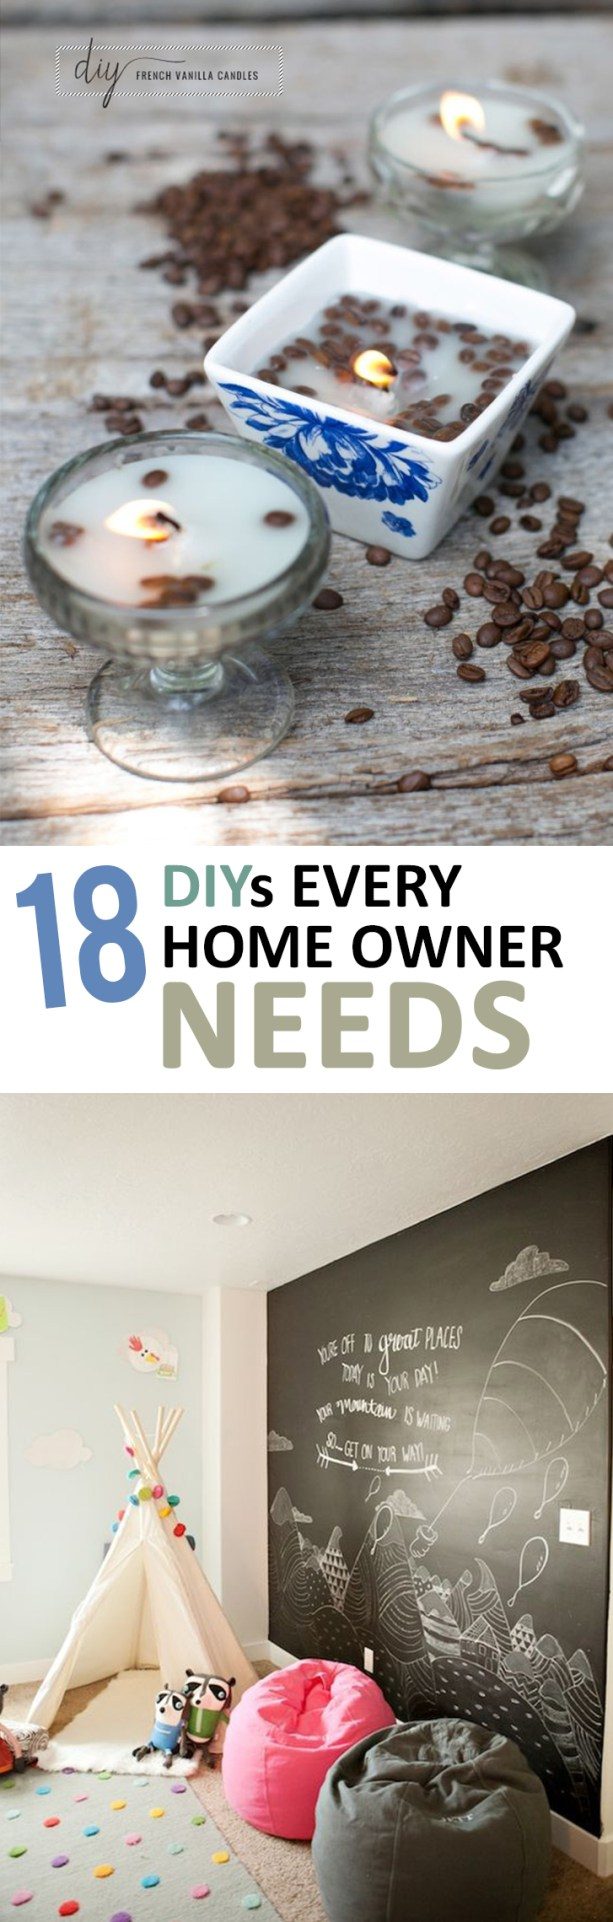 Home decor, DIY home decor, home DIY, popular pin, DIY, DIY home, easy DIYs, DIY tutorial, crafts, do it yourself crafts, home improvement hacks.